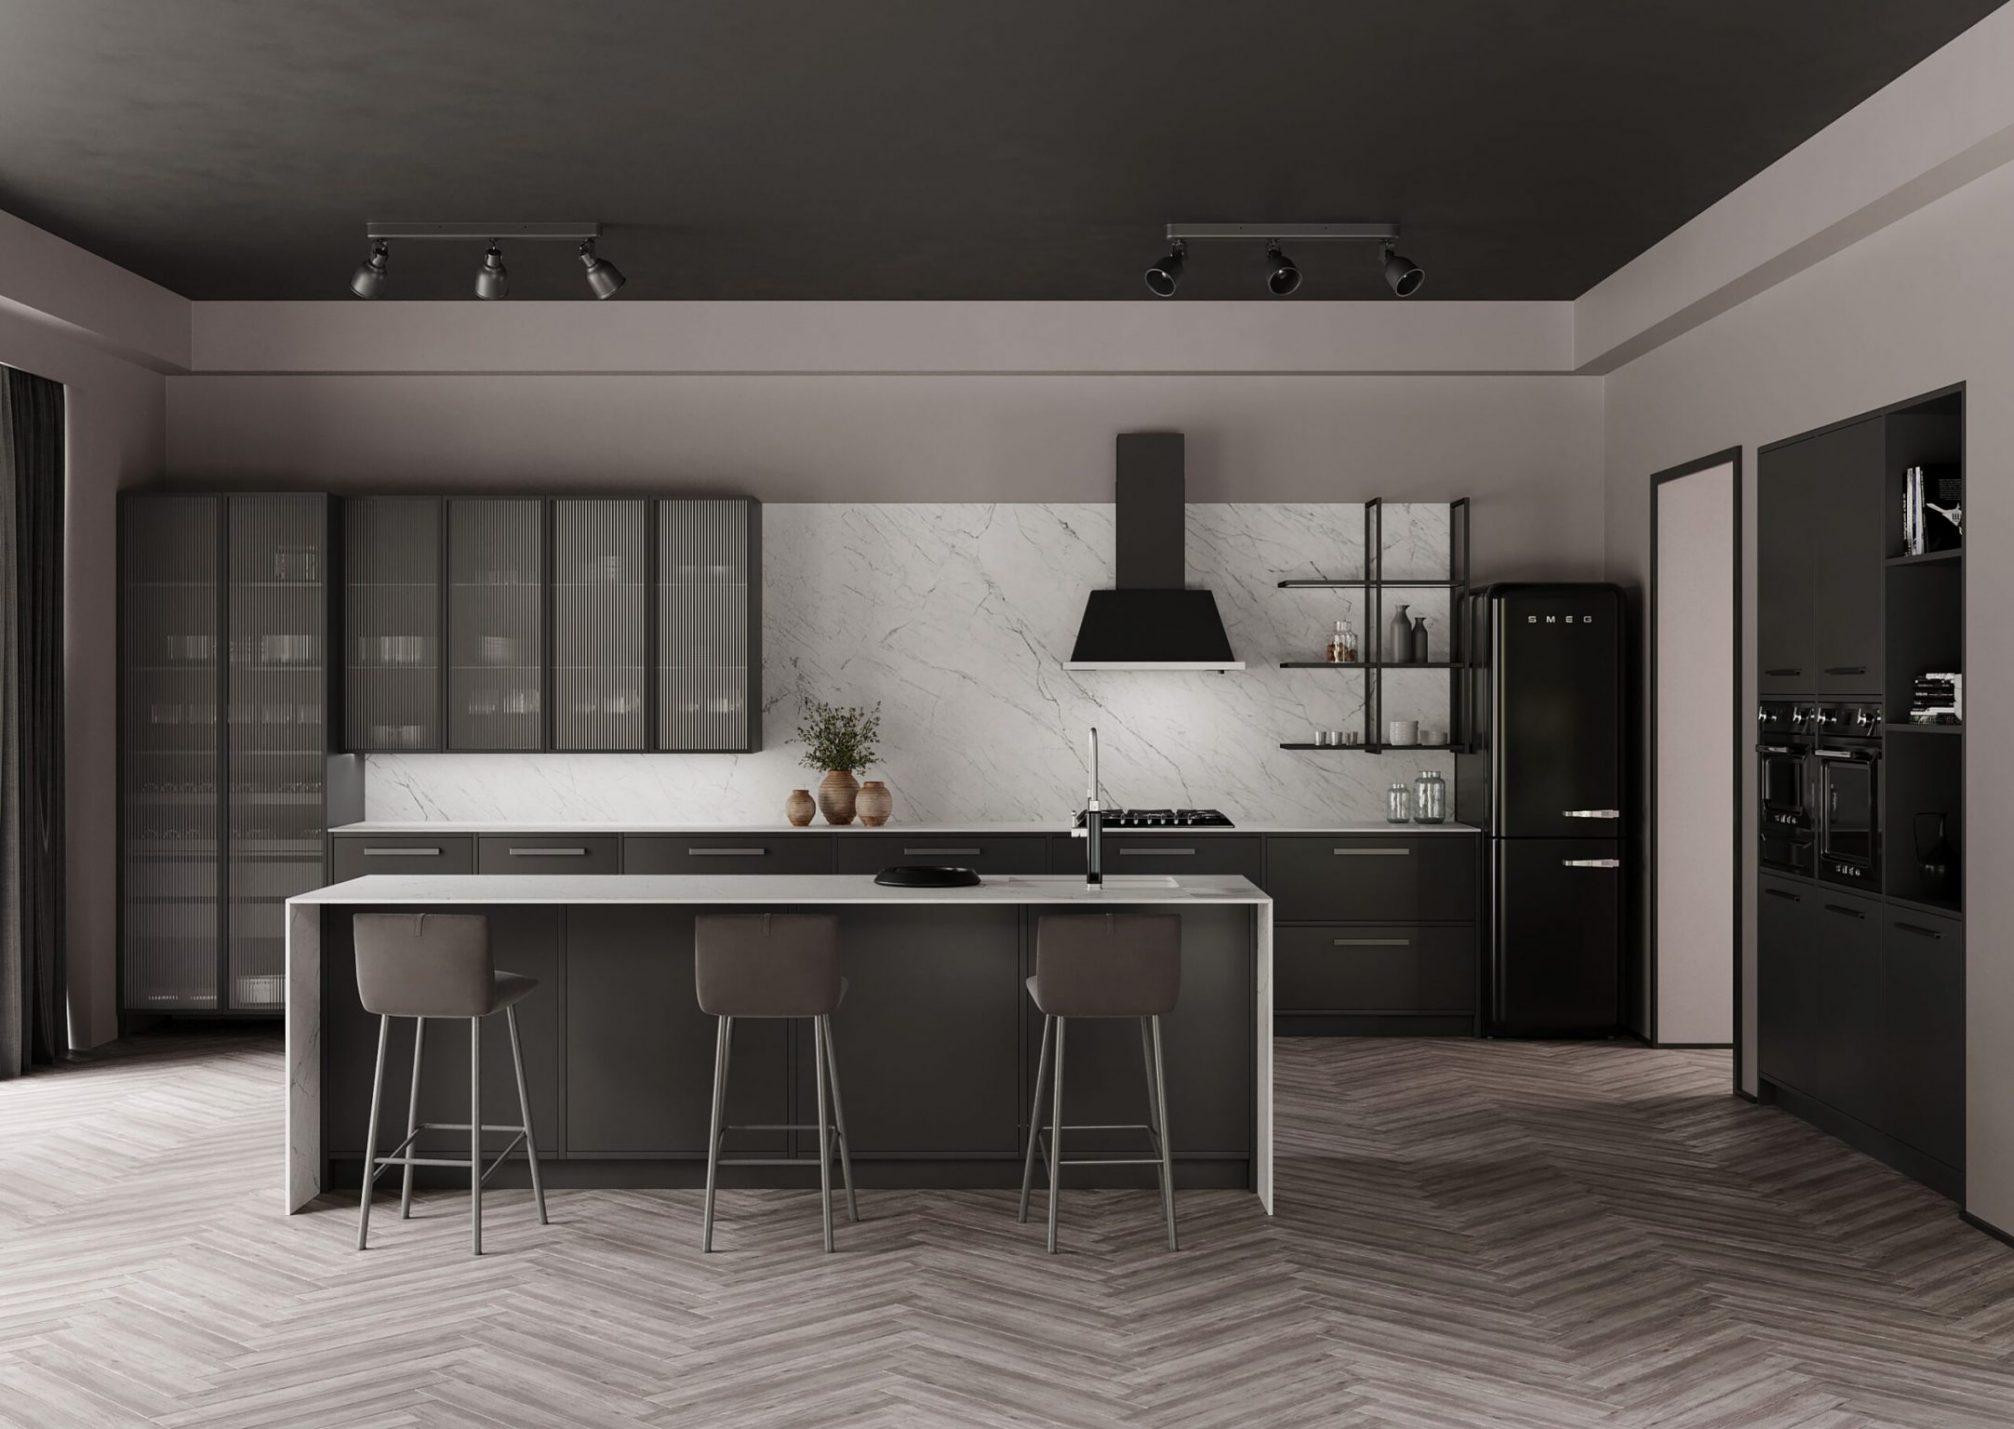 kitchen_studio_hygge_11-scaled